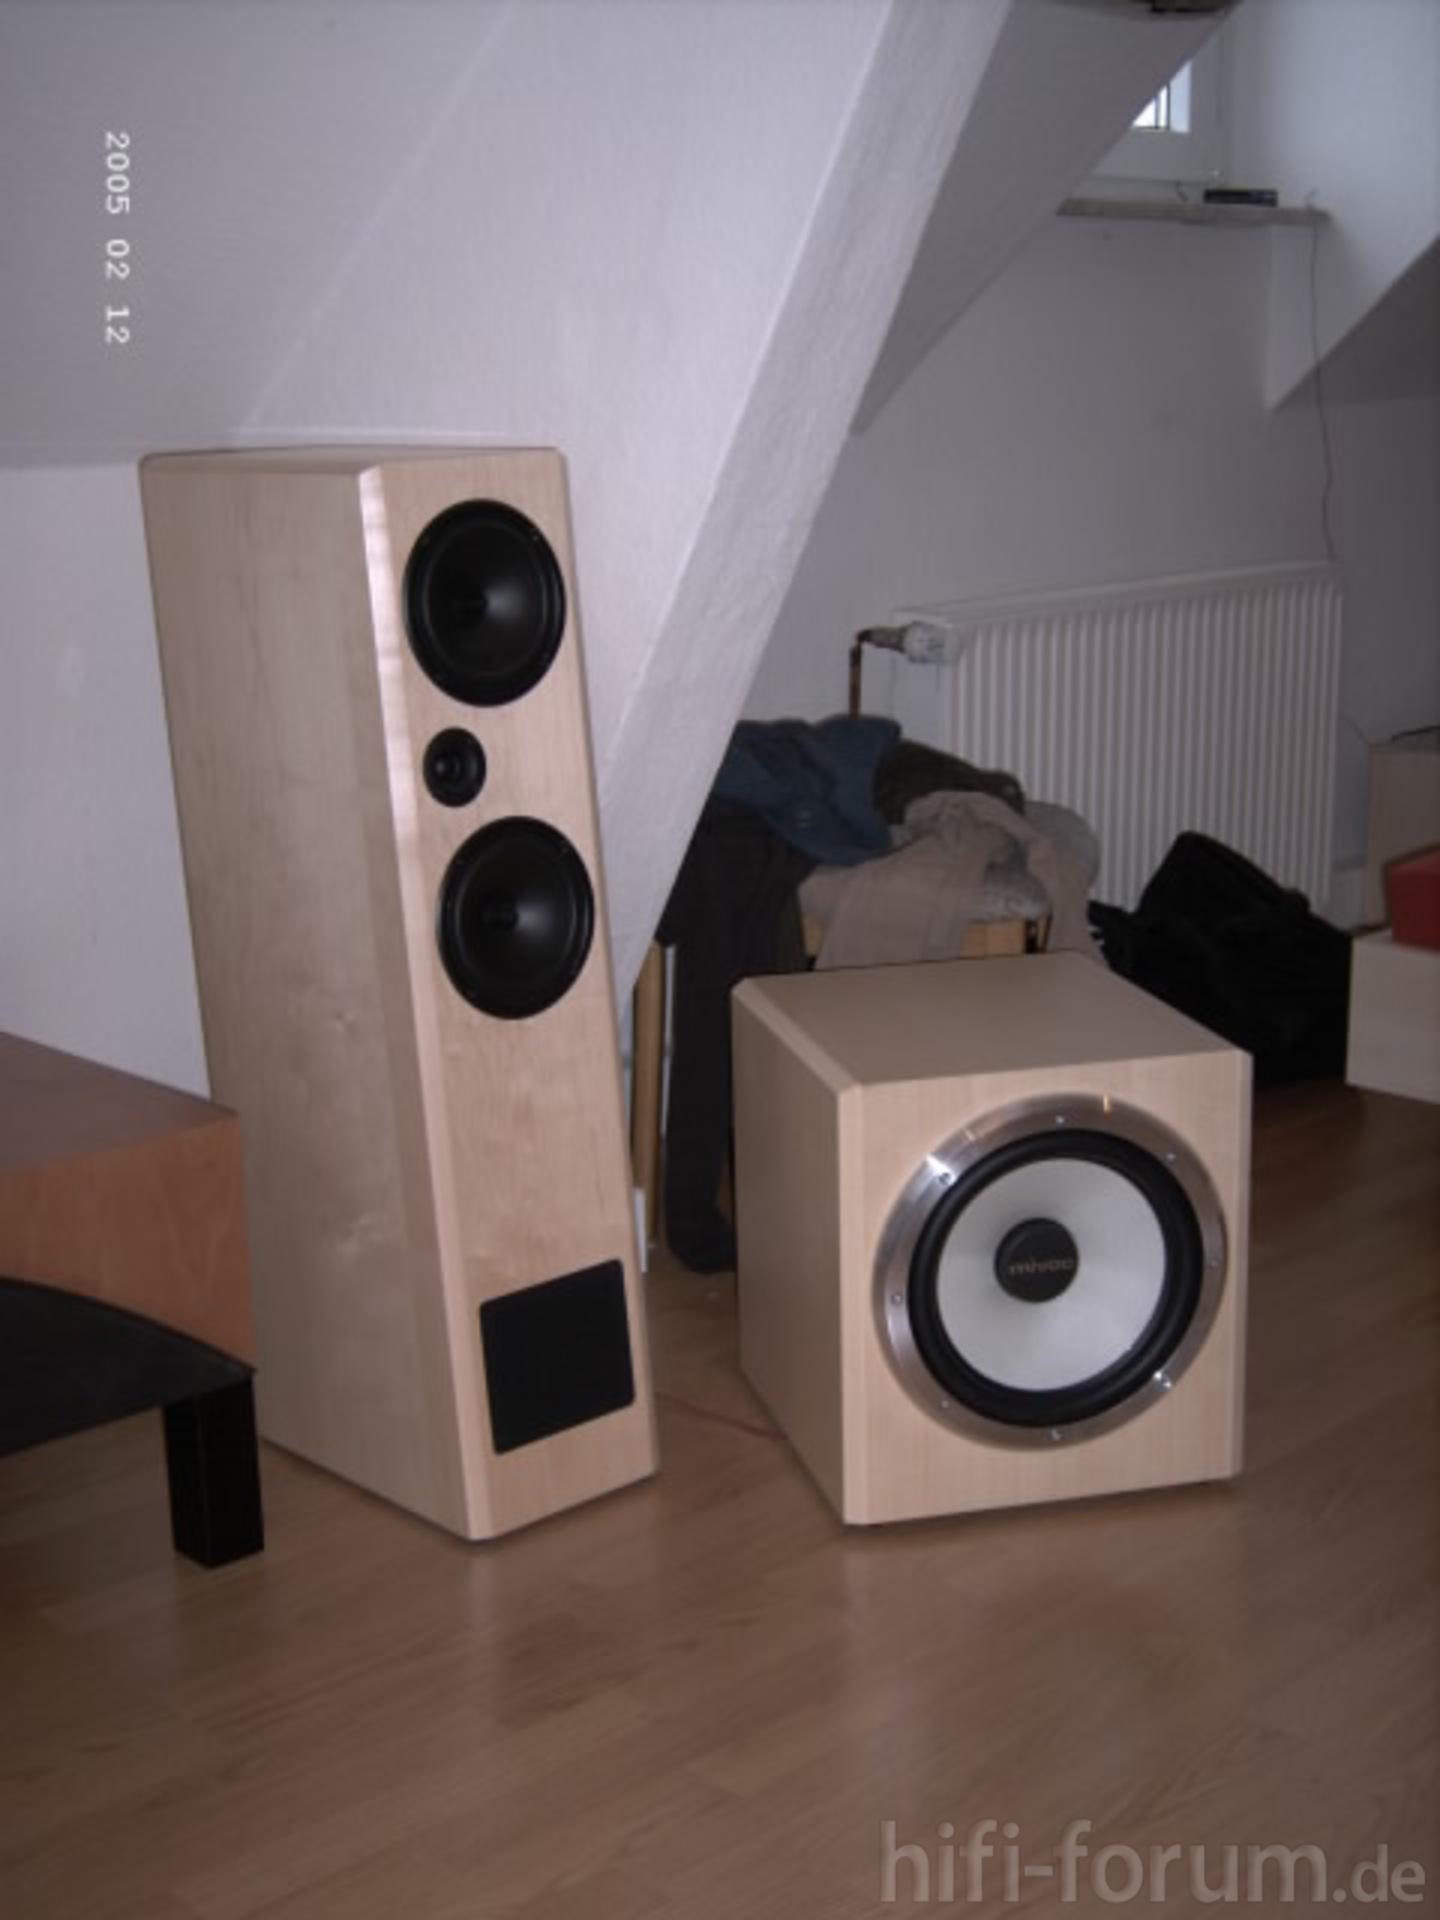 ct 206 und mivoc subwoofer do it yourself hifi bildergalerie. Black Bedroom Furniture Sets. Home Design Ideas